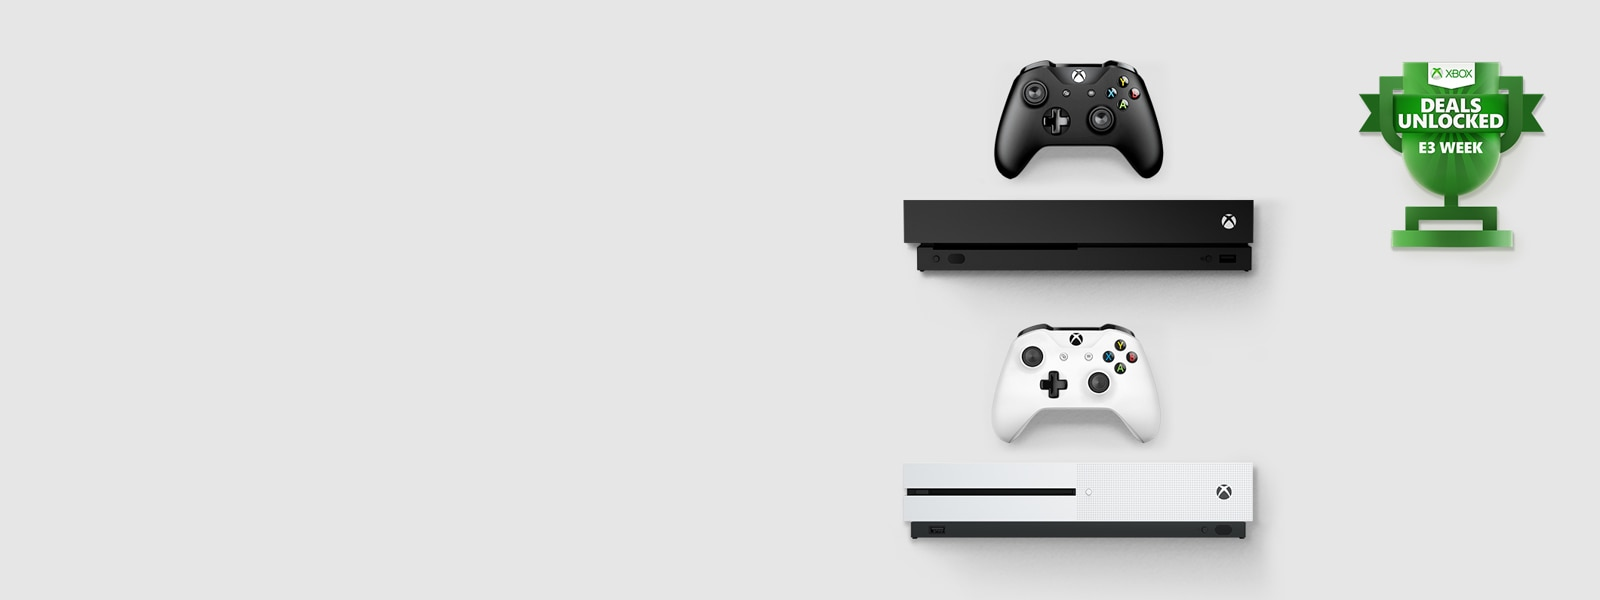 Xbox One X console, Xbox One S console, E3 Deals Unlocked logo